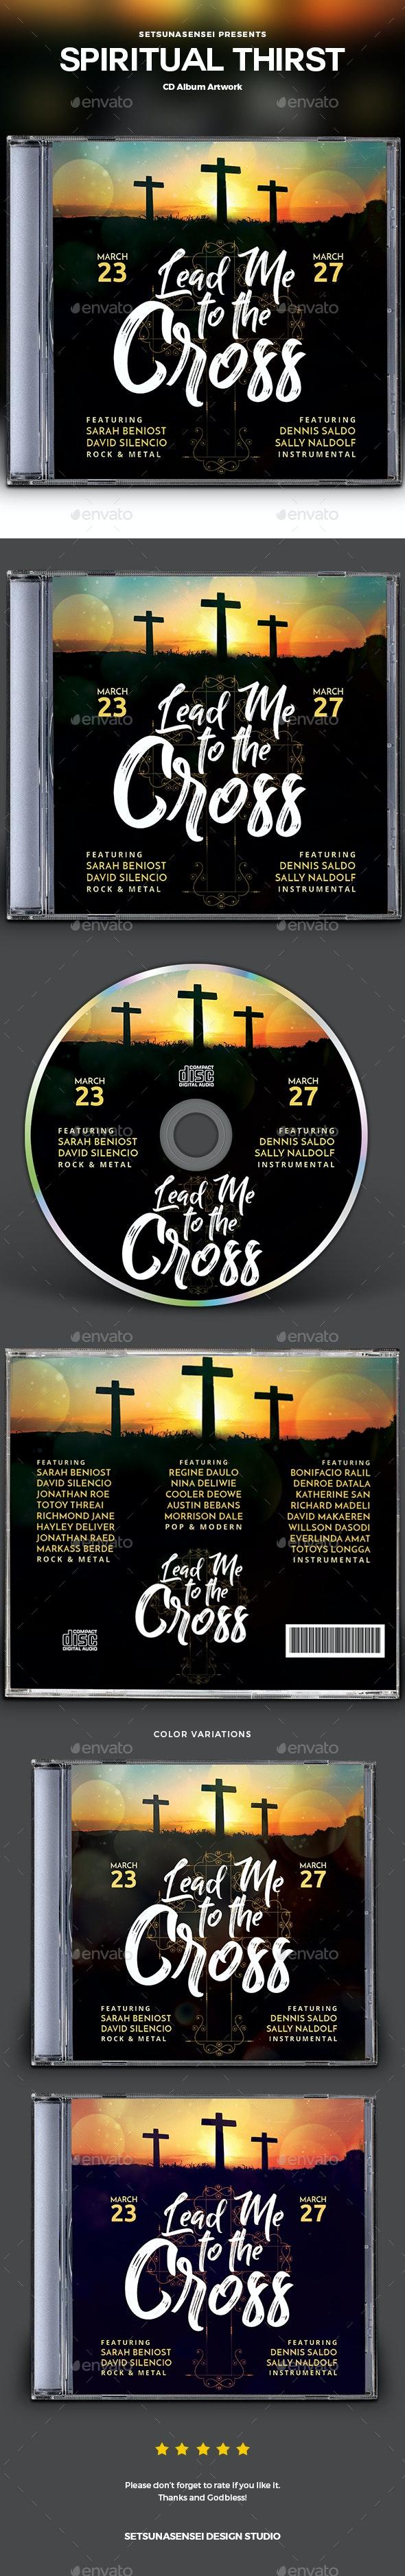 Lead Me to the Cross CD Album Artwork - CD & DVD Artwork Print Templates